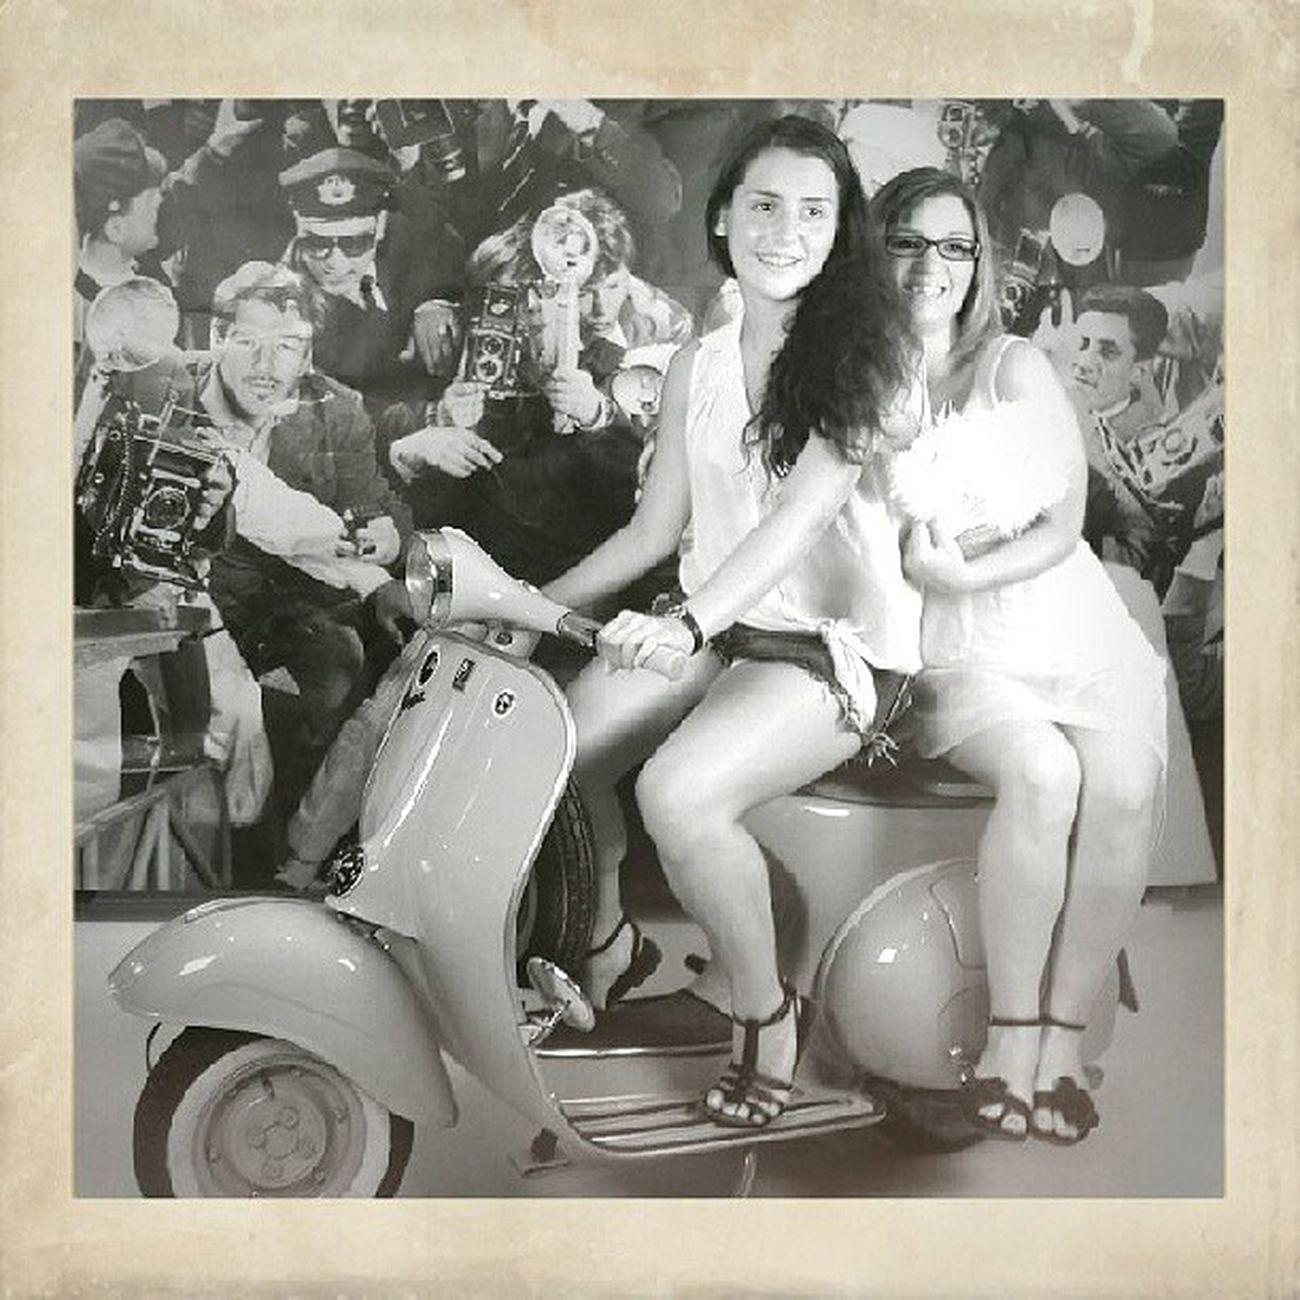 #piccante #photosicafe #photosi #printup #paparazzi #riccione #redcarpet #makkaroni Paparazzi Riccione Redcarpet Piccante Printup Photosi Photosicafe Makkaroni